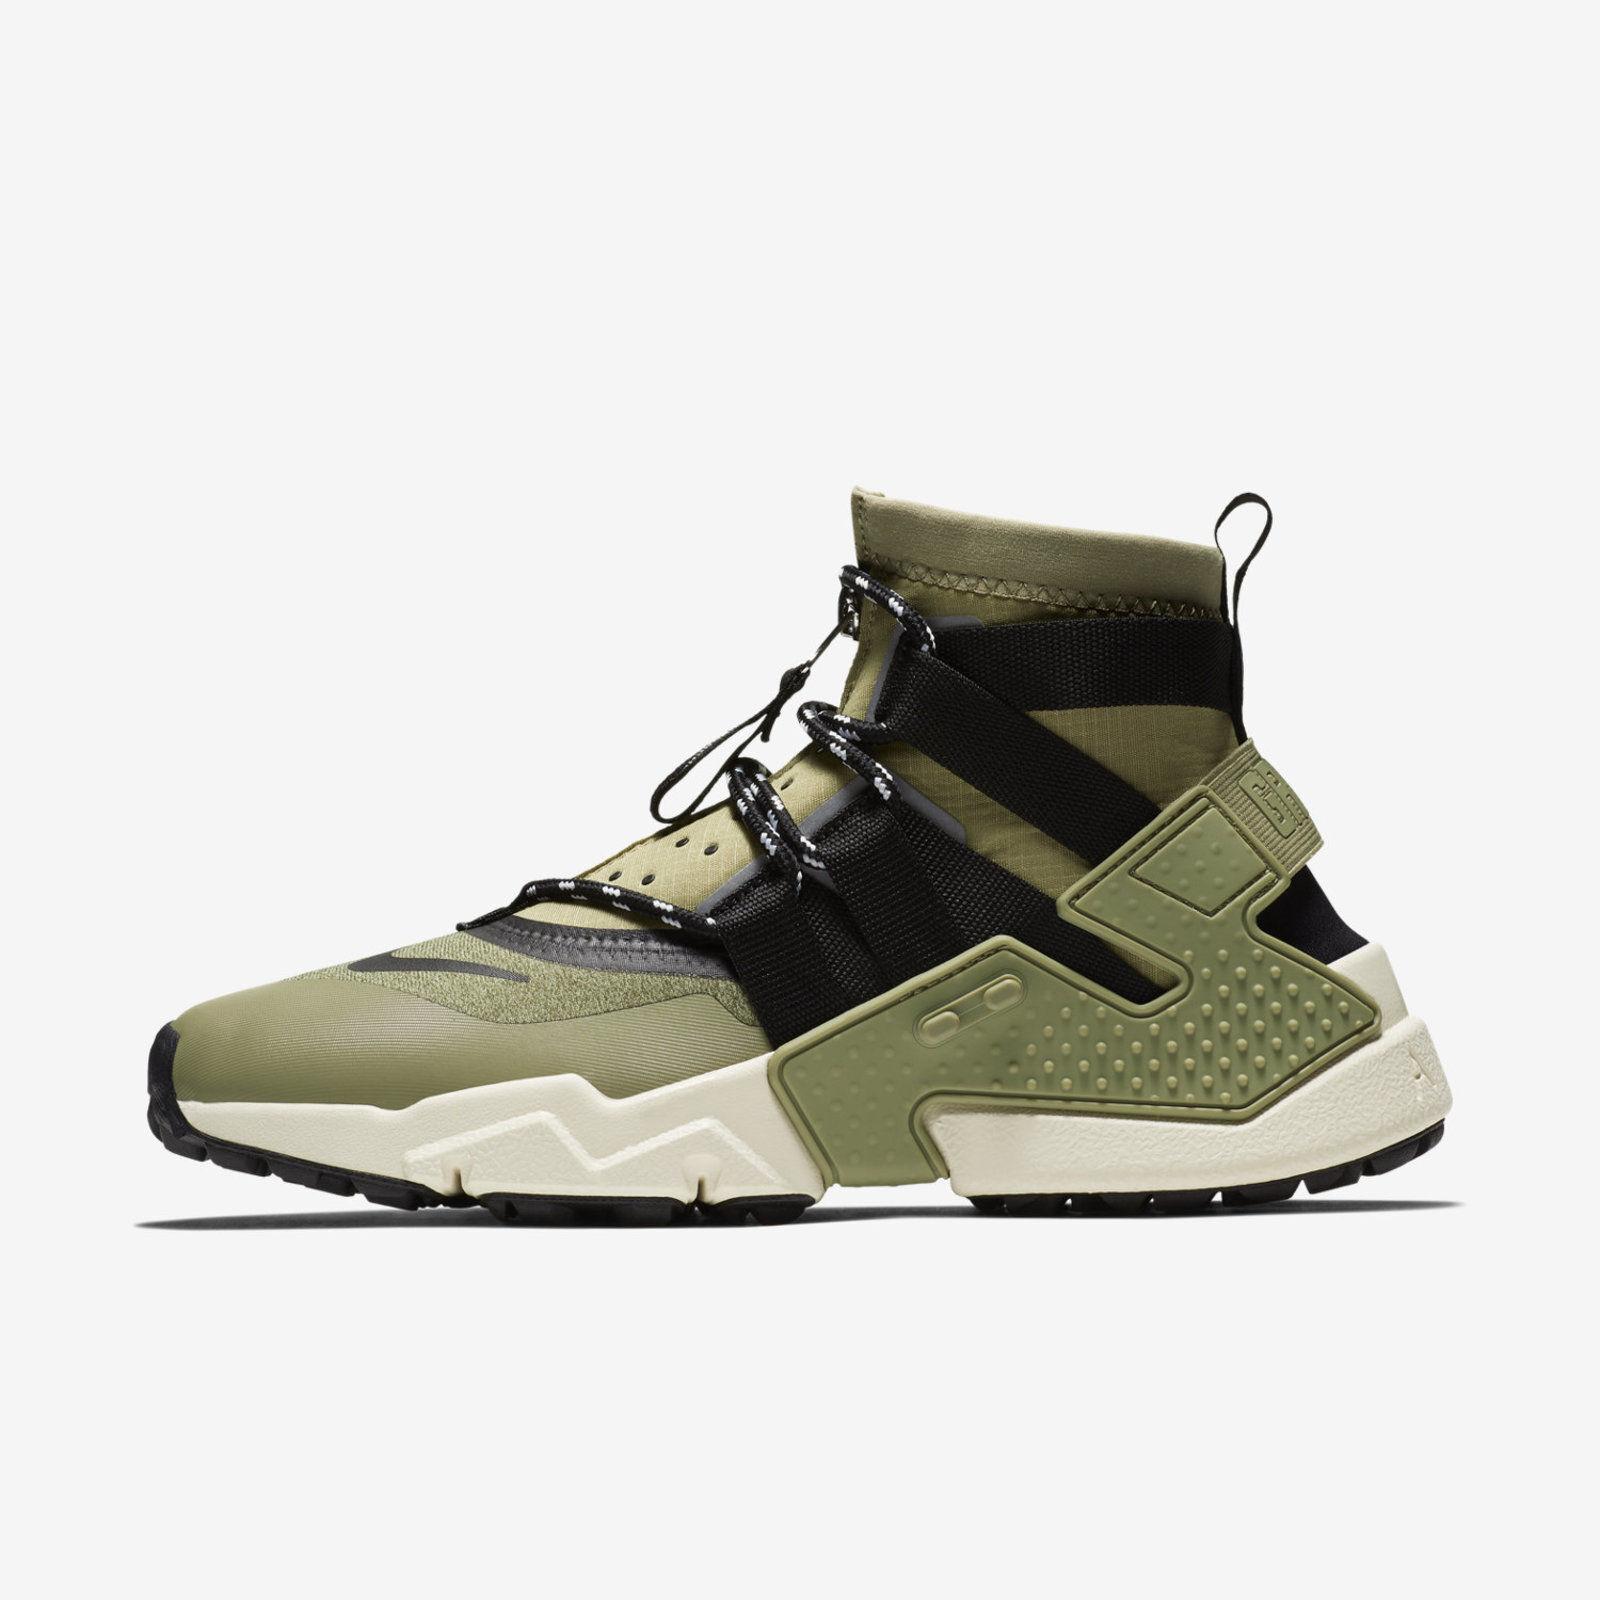 MEN'S Nike Air Huarache Gripp [AO1730-200]  shoes Sz 14  Neutral Olive Black